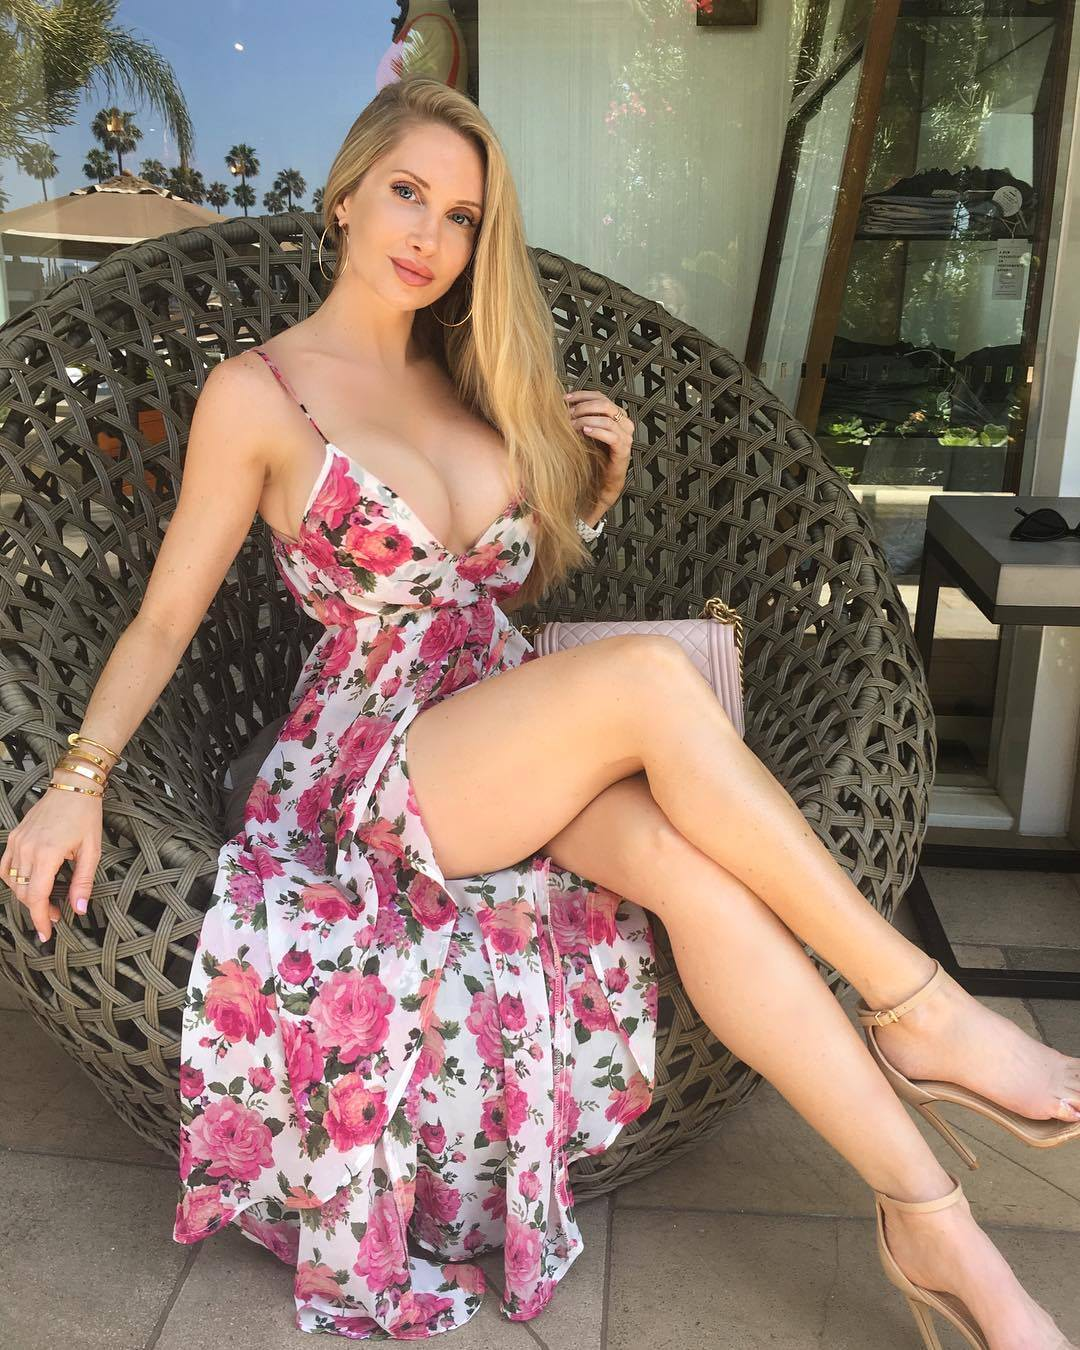 Amanda Elise Porn amanda lee sex tape & nudes leaked!   prothots